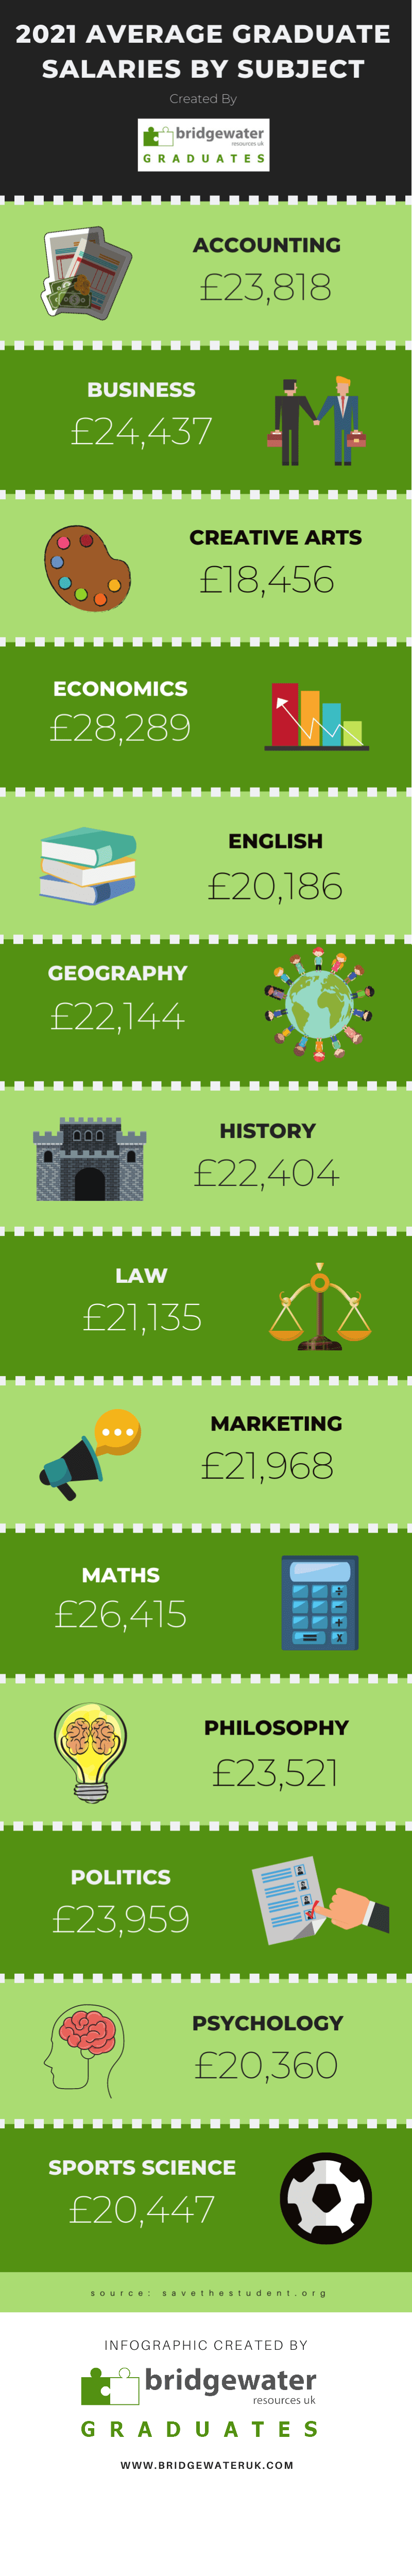 Average graduate salary uk 2021